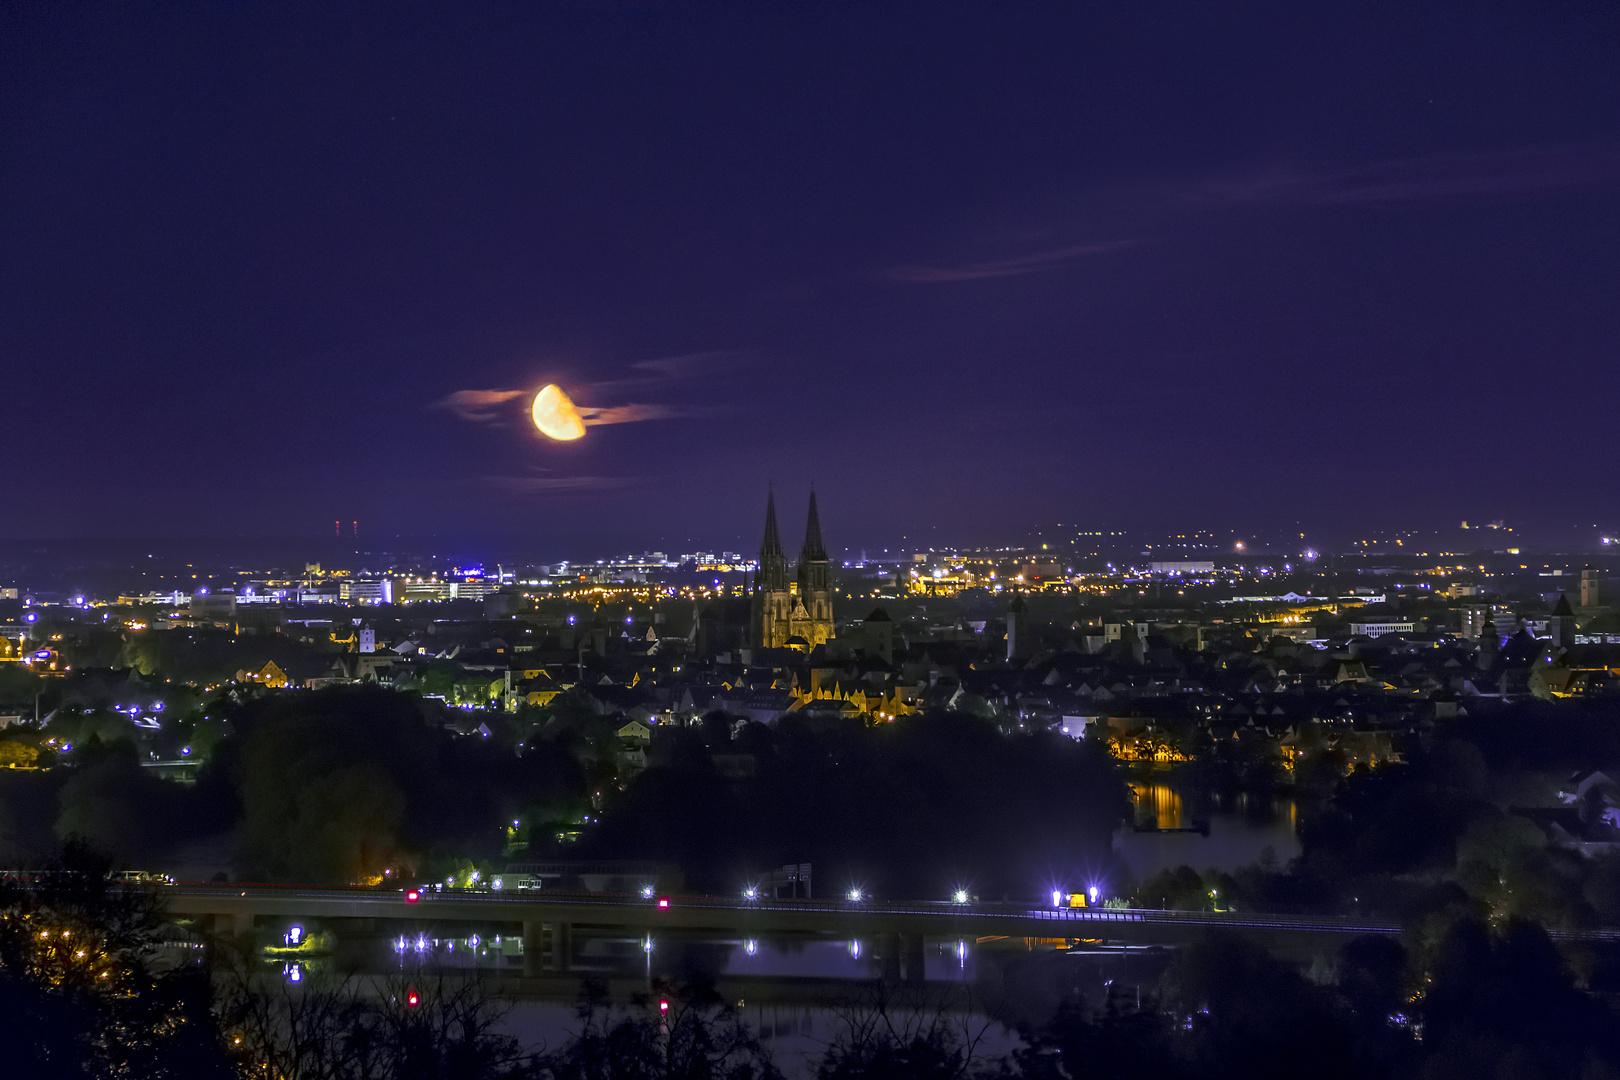 Moonraise